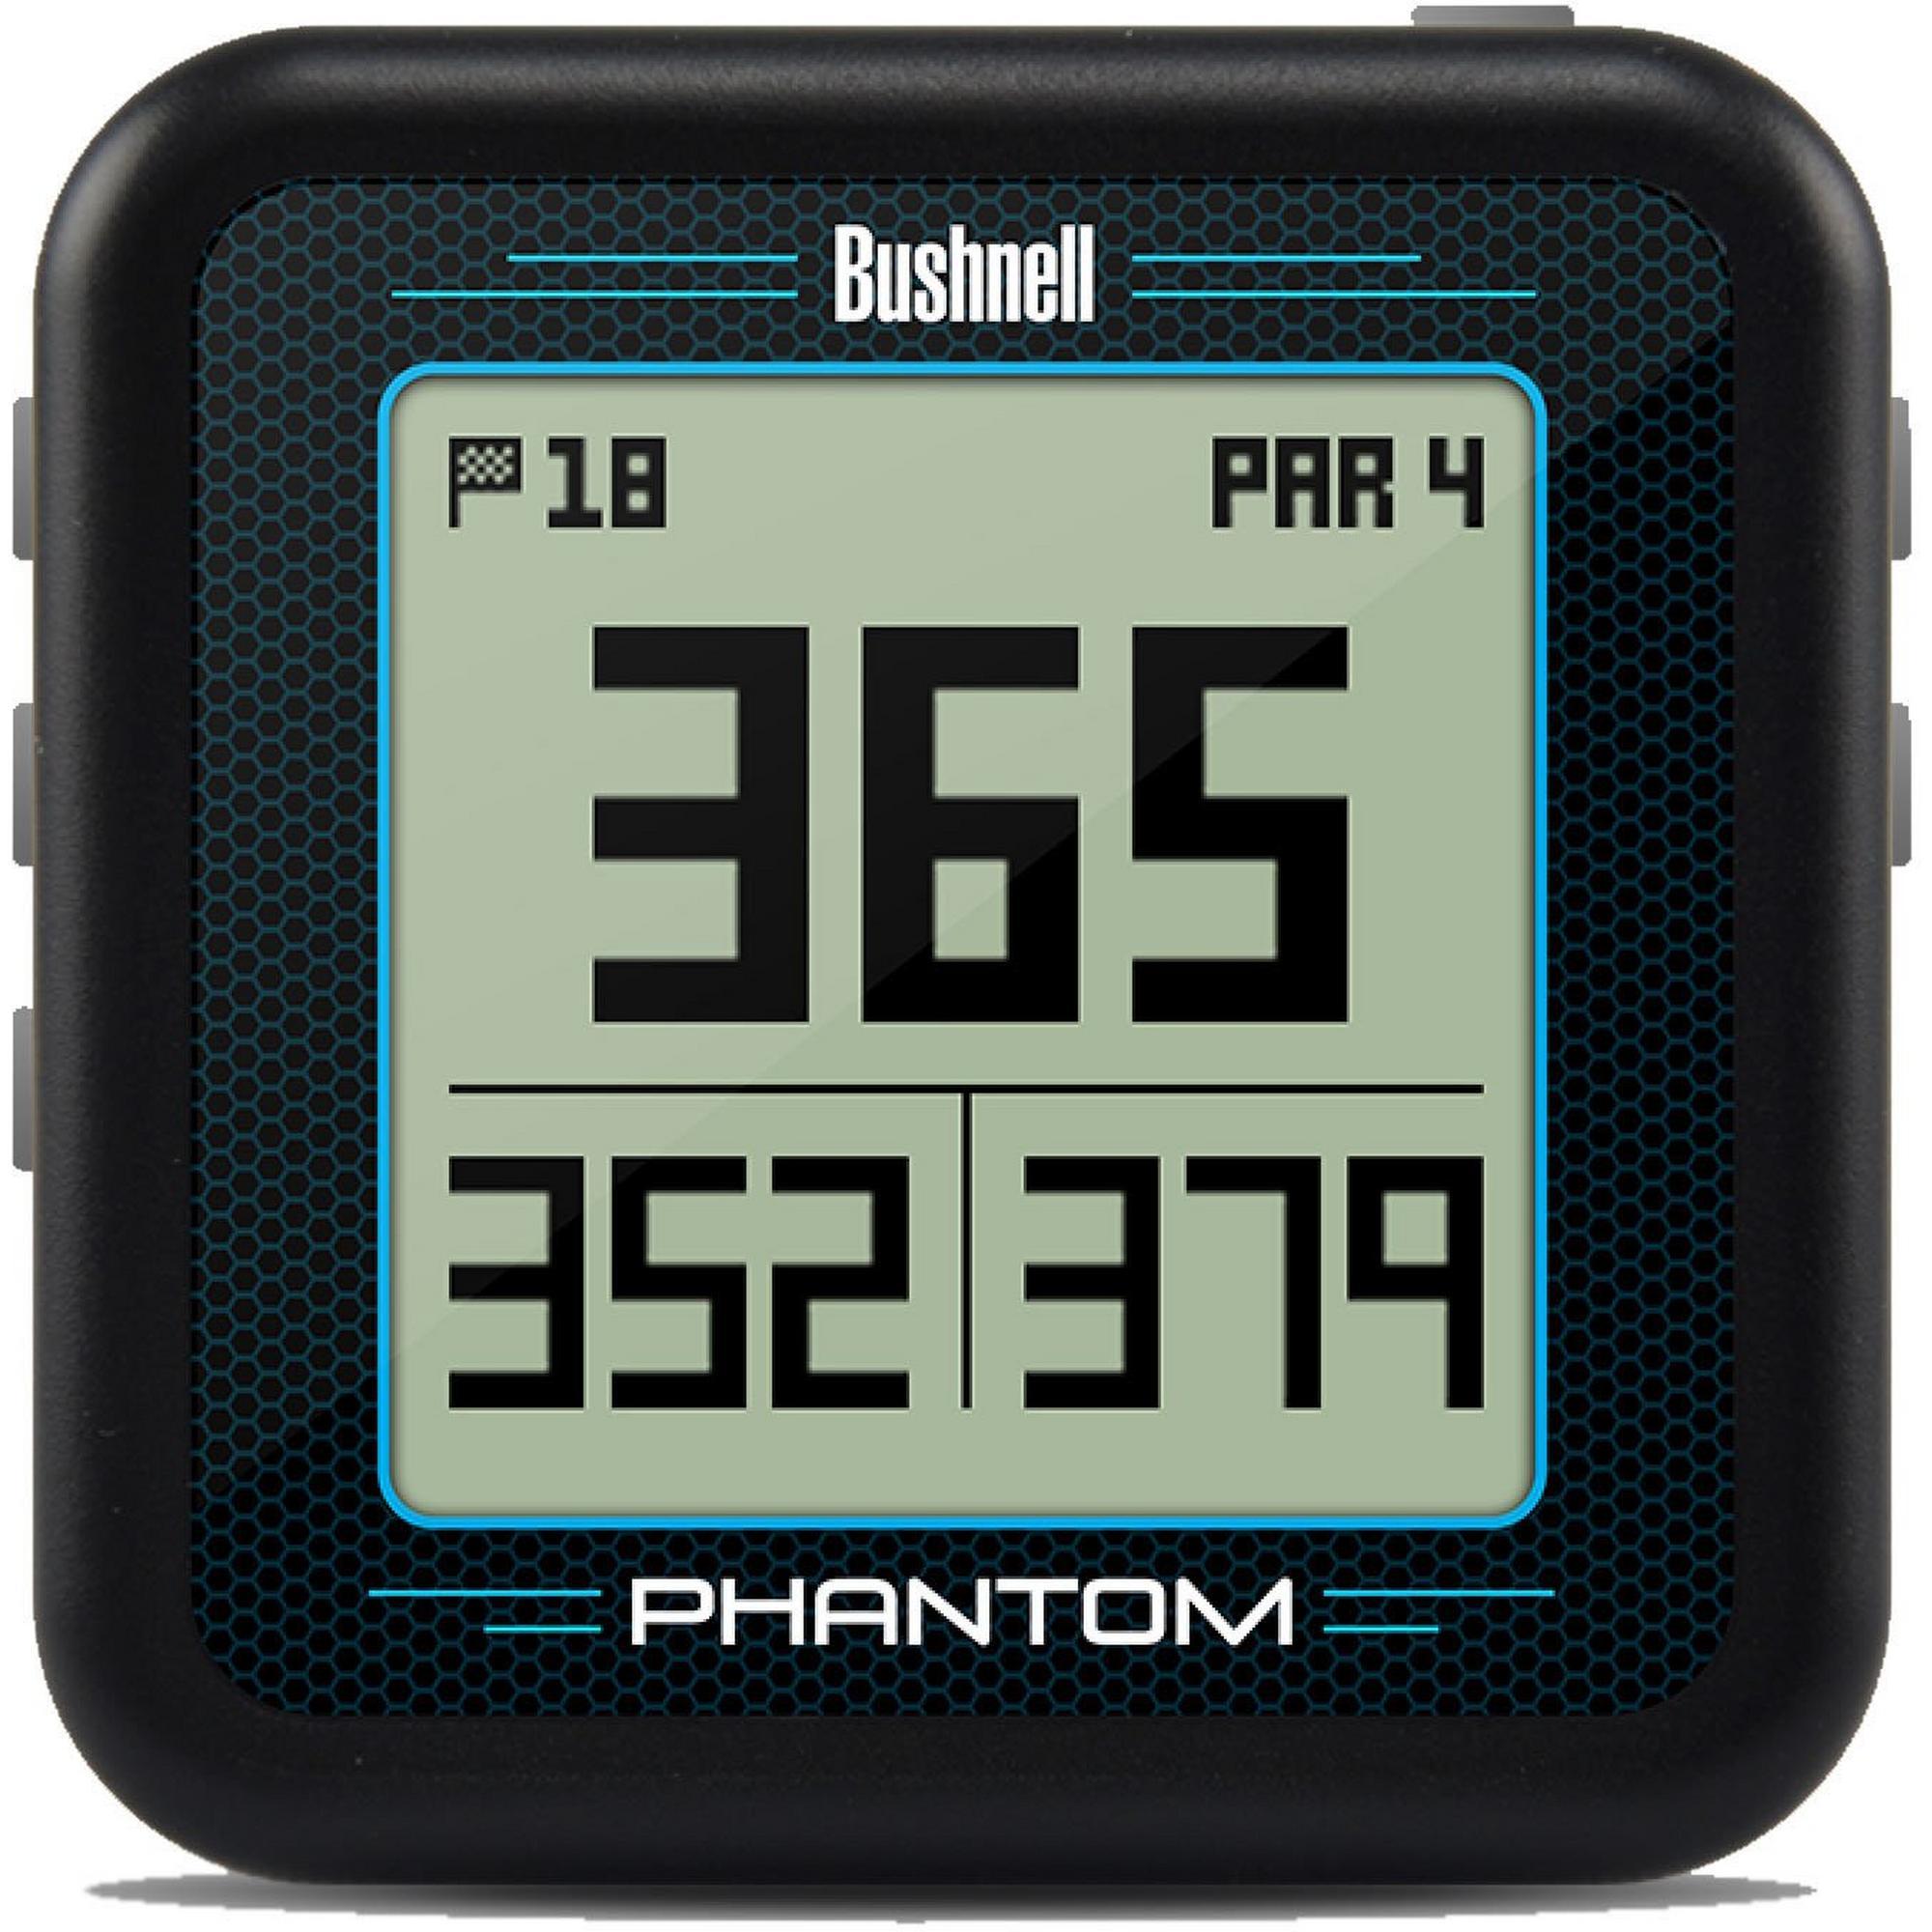 Phantom Golf GPS